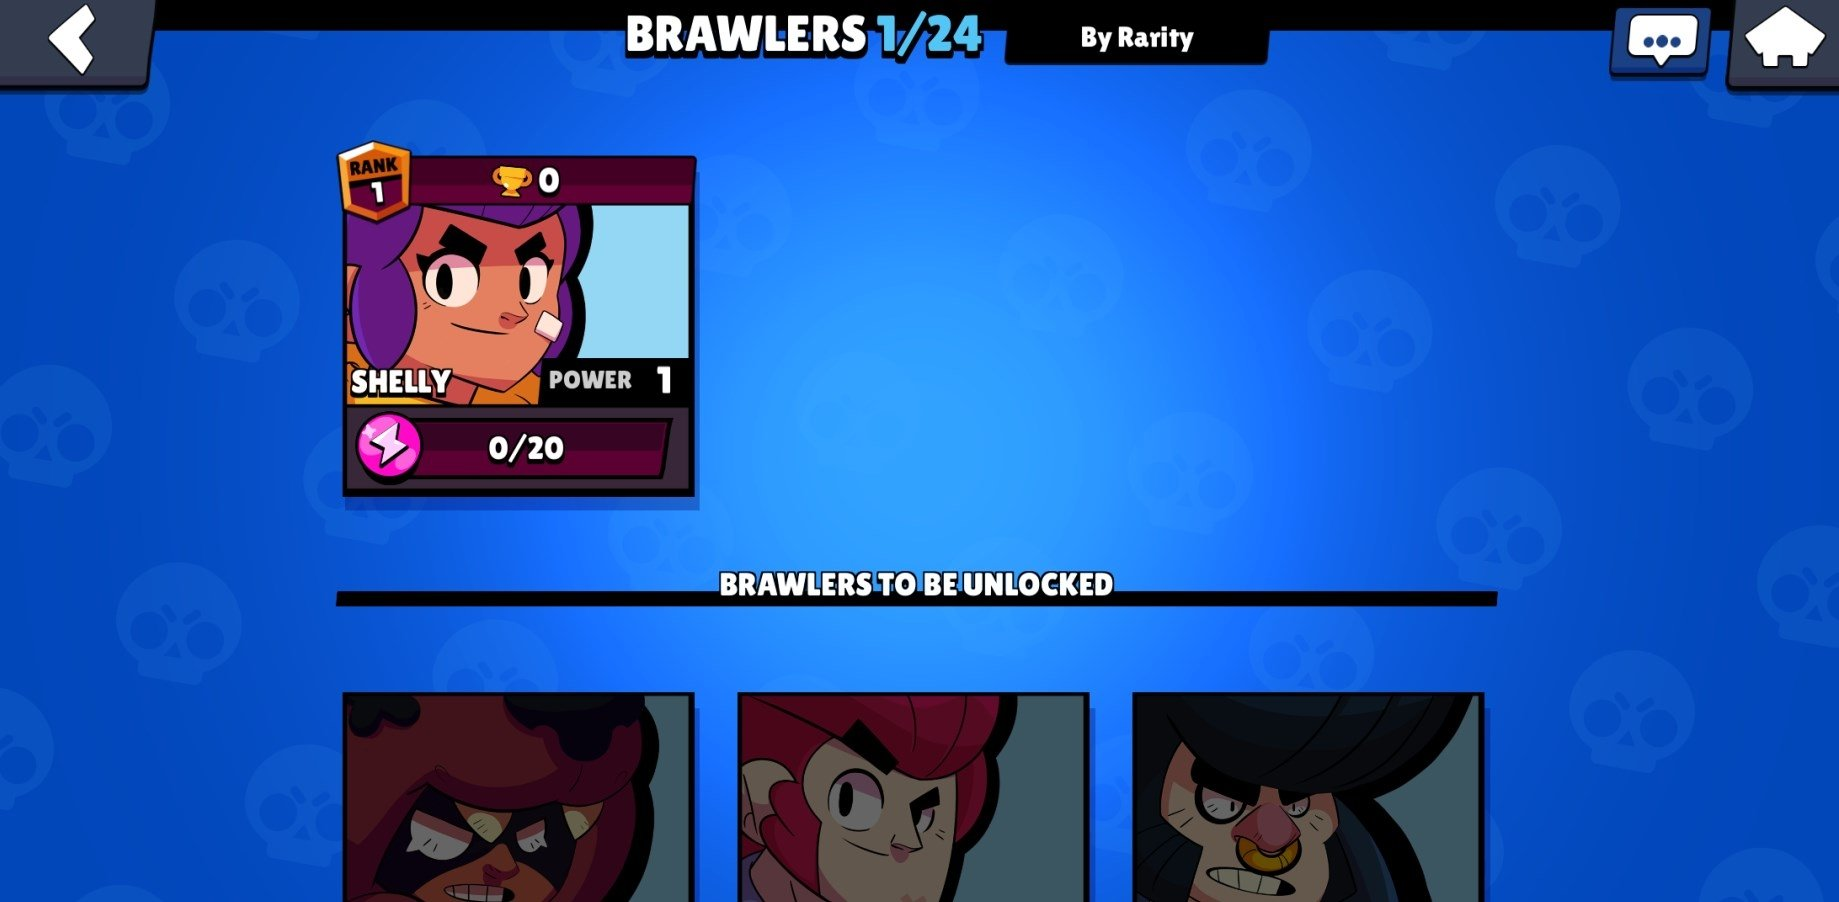 brawl stars mod apk private server